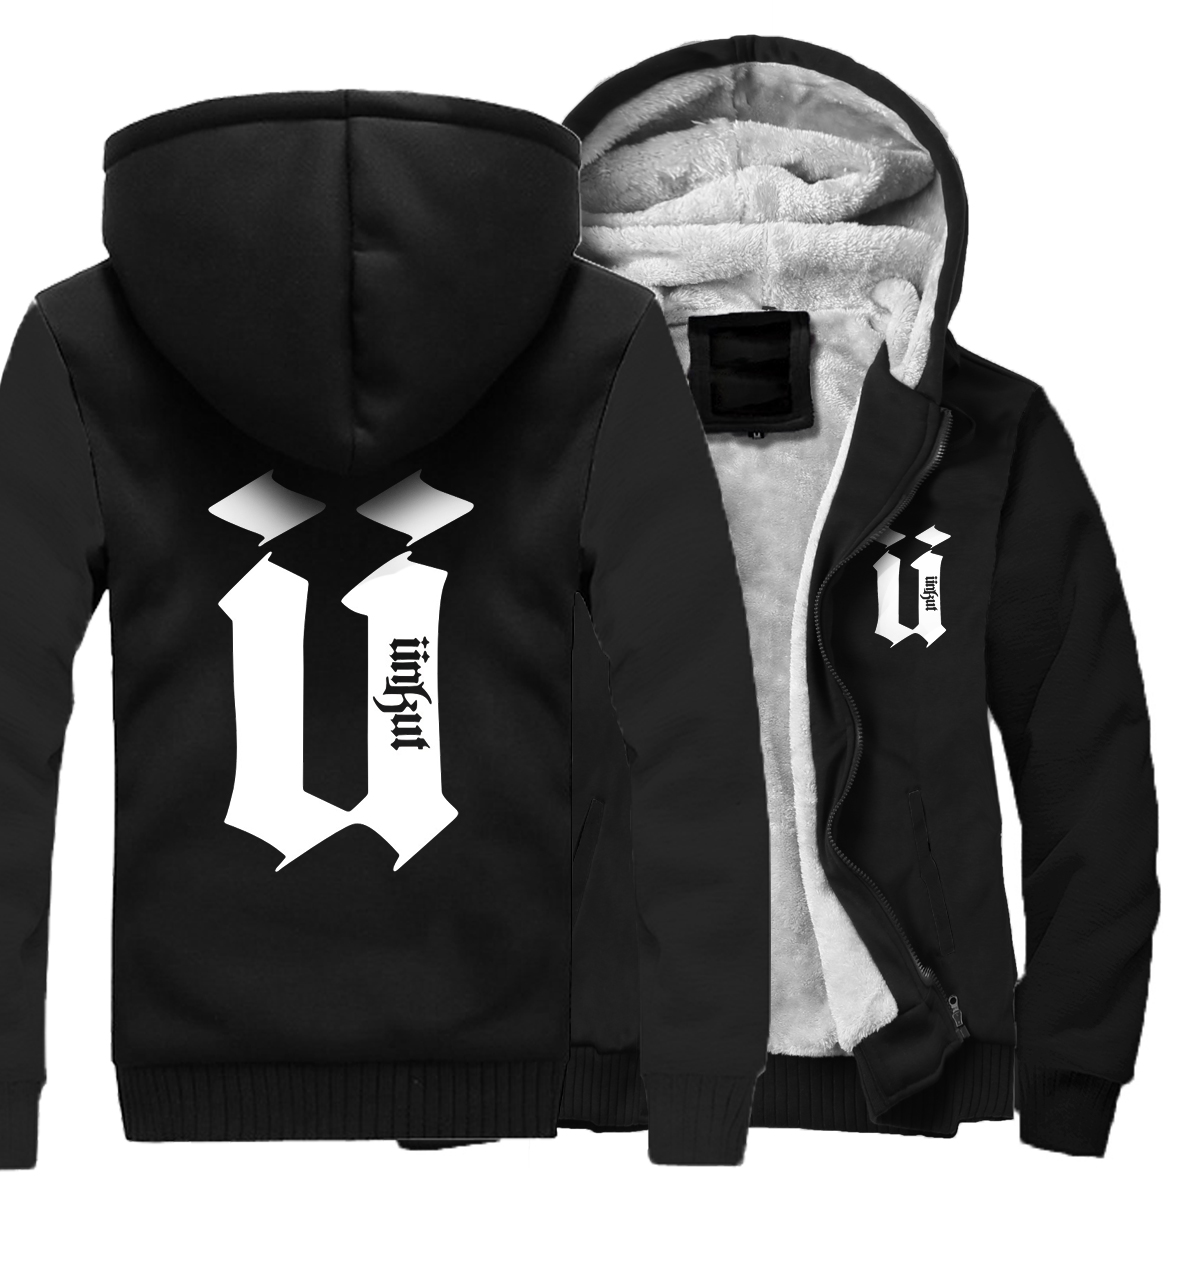 Fashion Brand Sweatshirts Men 2019 Winter Fleece Hoody Zip Up Thick Jacket Harajuku Hoody Men 39 s Tracksuit Hip Hop Hoodies Kawaii in Hoodies amp Sweatshirts from Men 39 s Clothing